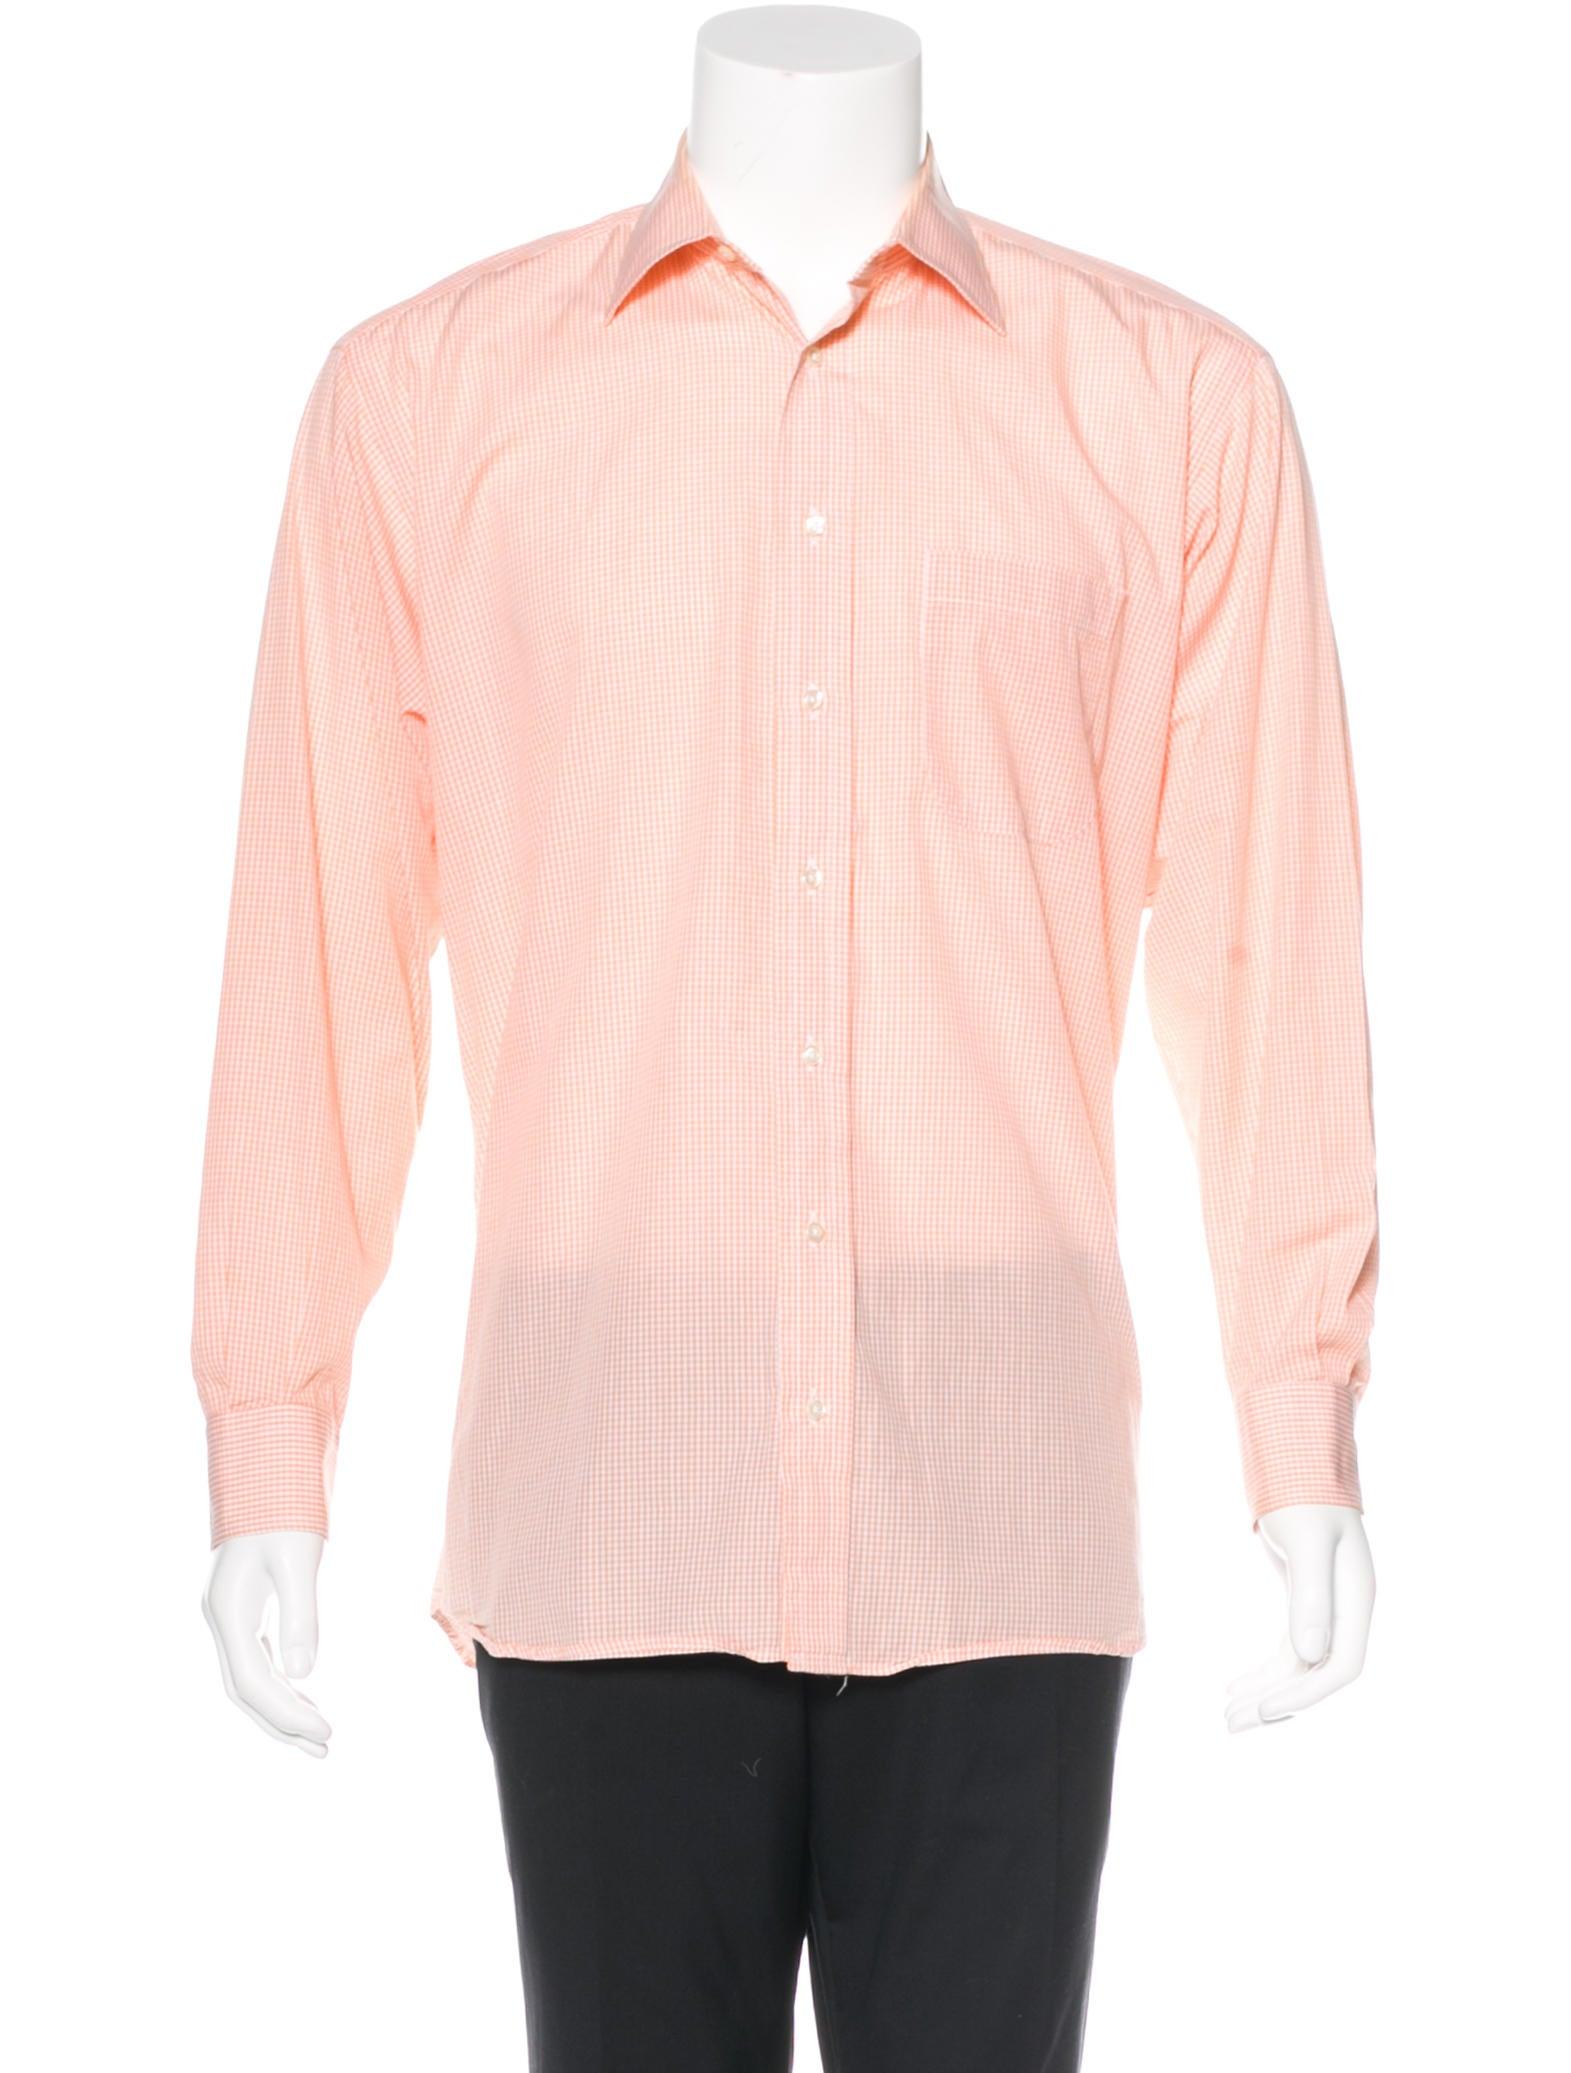 Burberry London Gingham Woven Shirt Clothing